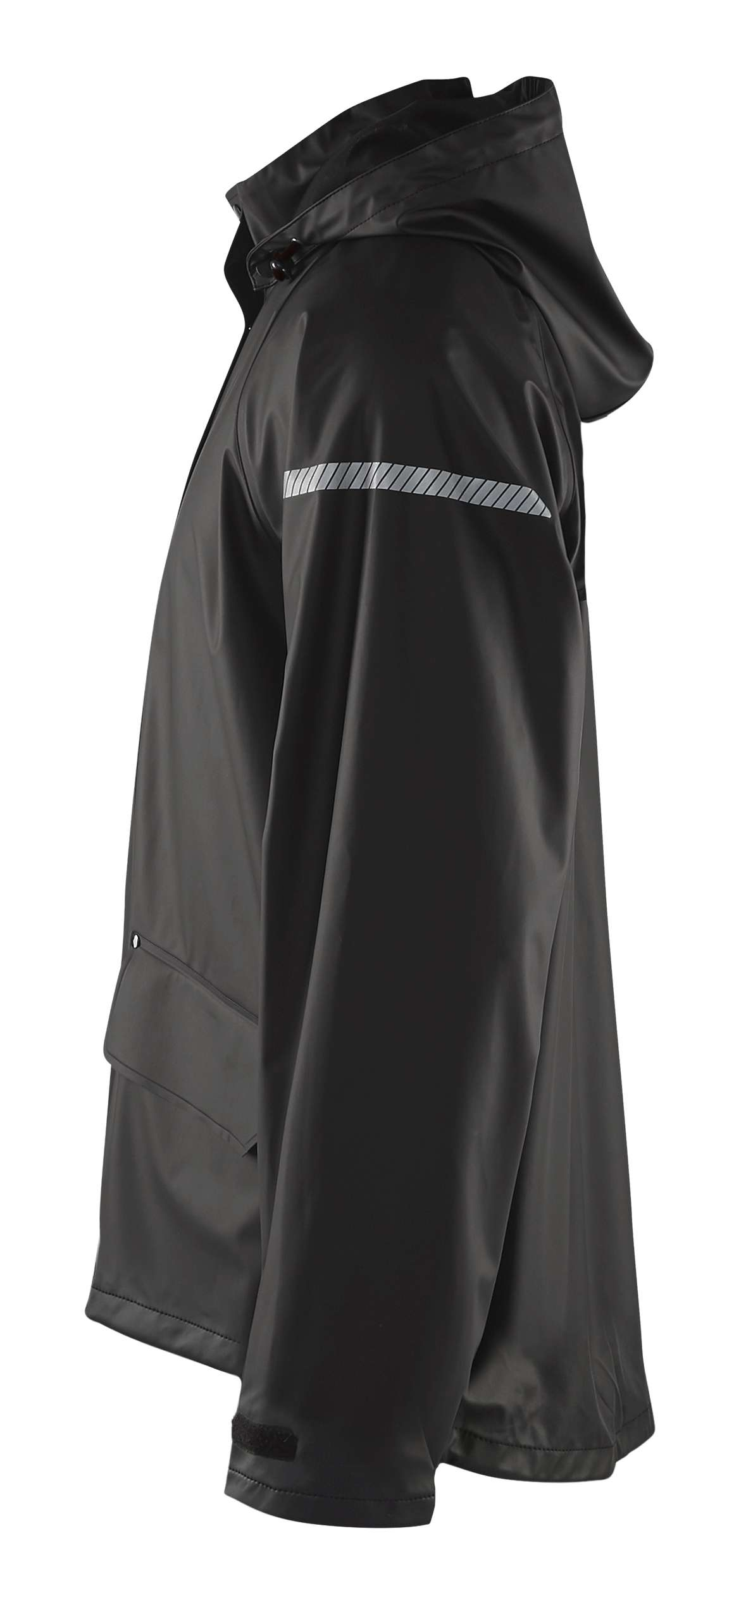 Blaklader Regenjacks 43112000 zwart(9900)